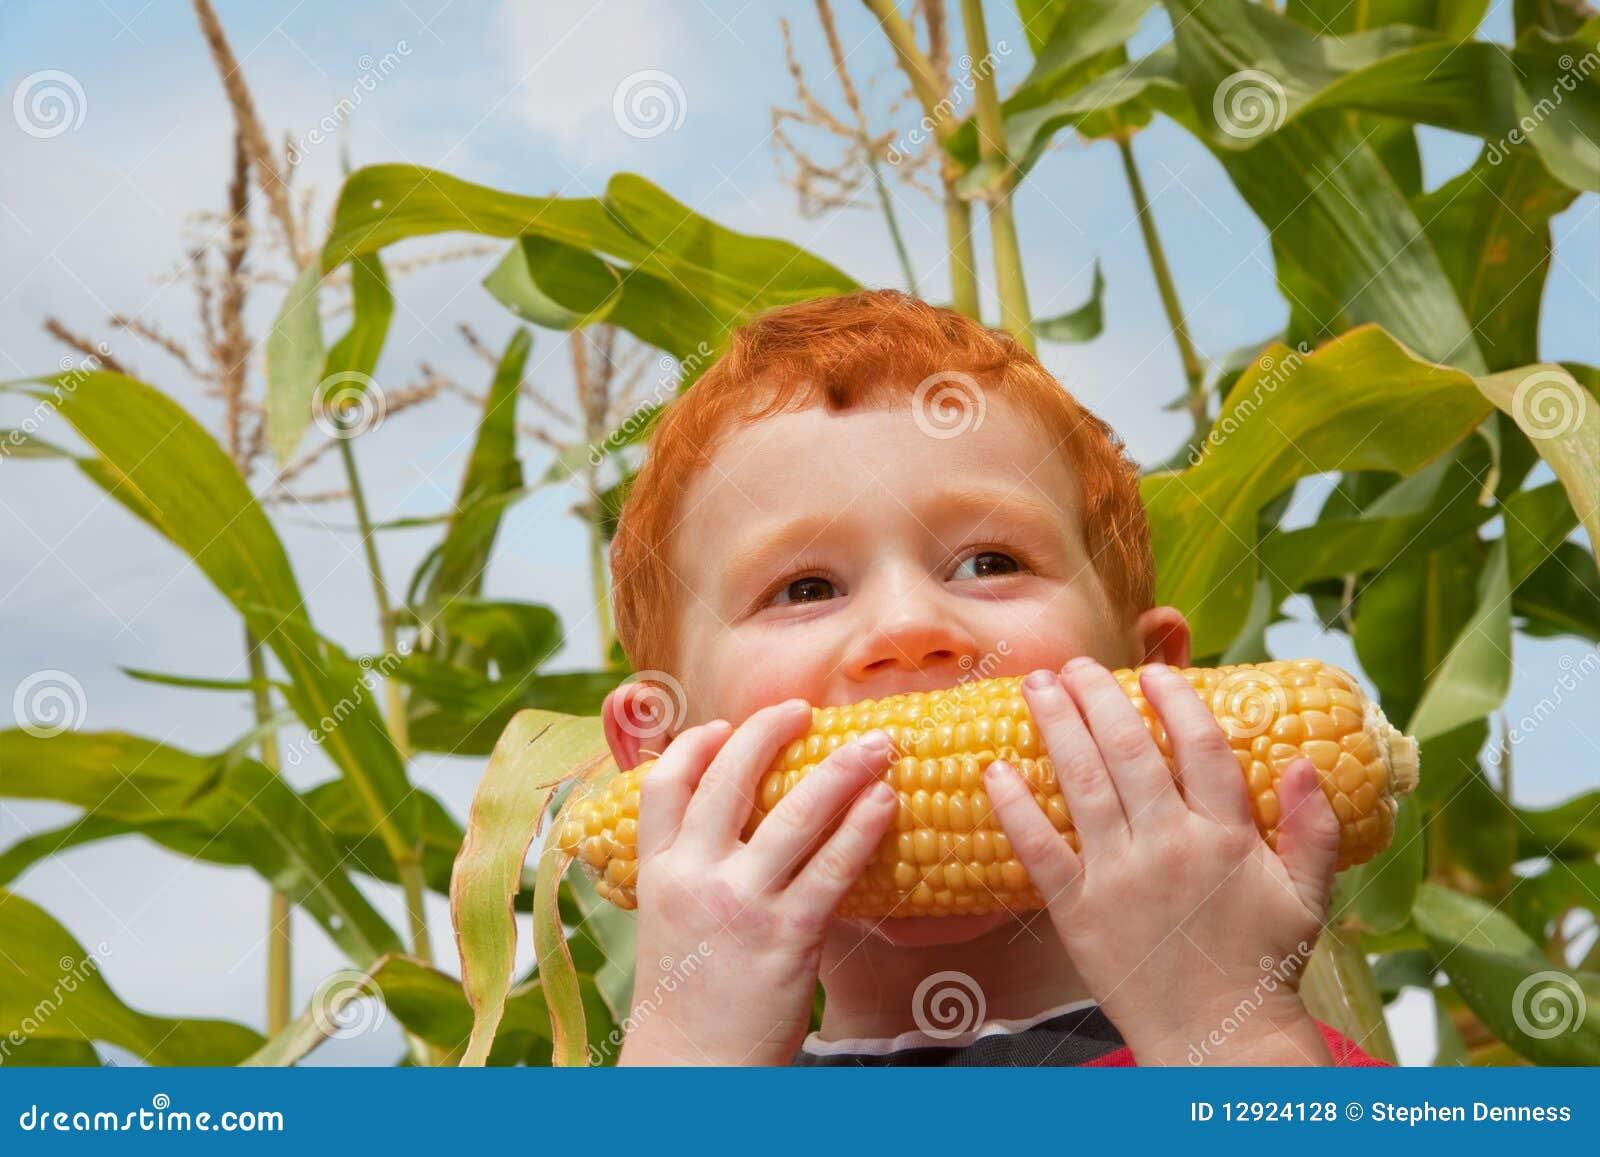 Boy child eating organic corn in garden